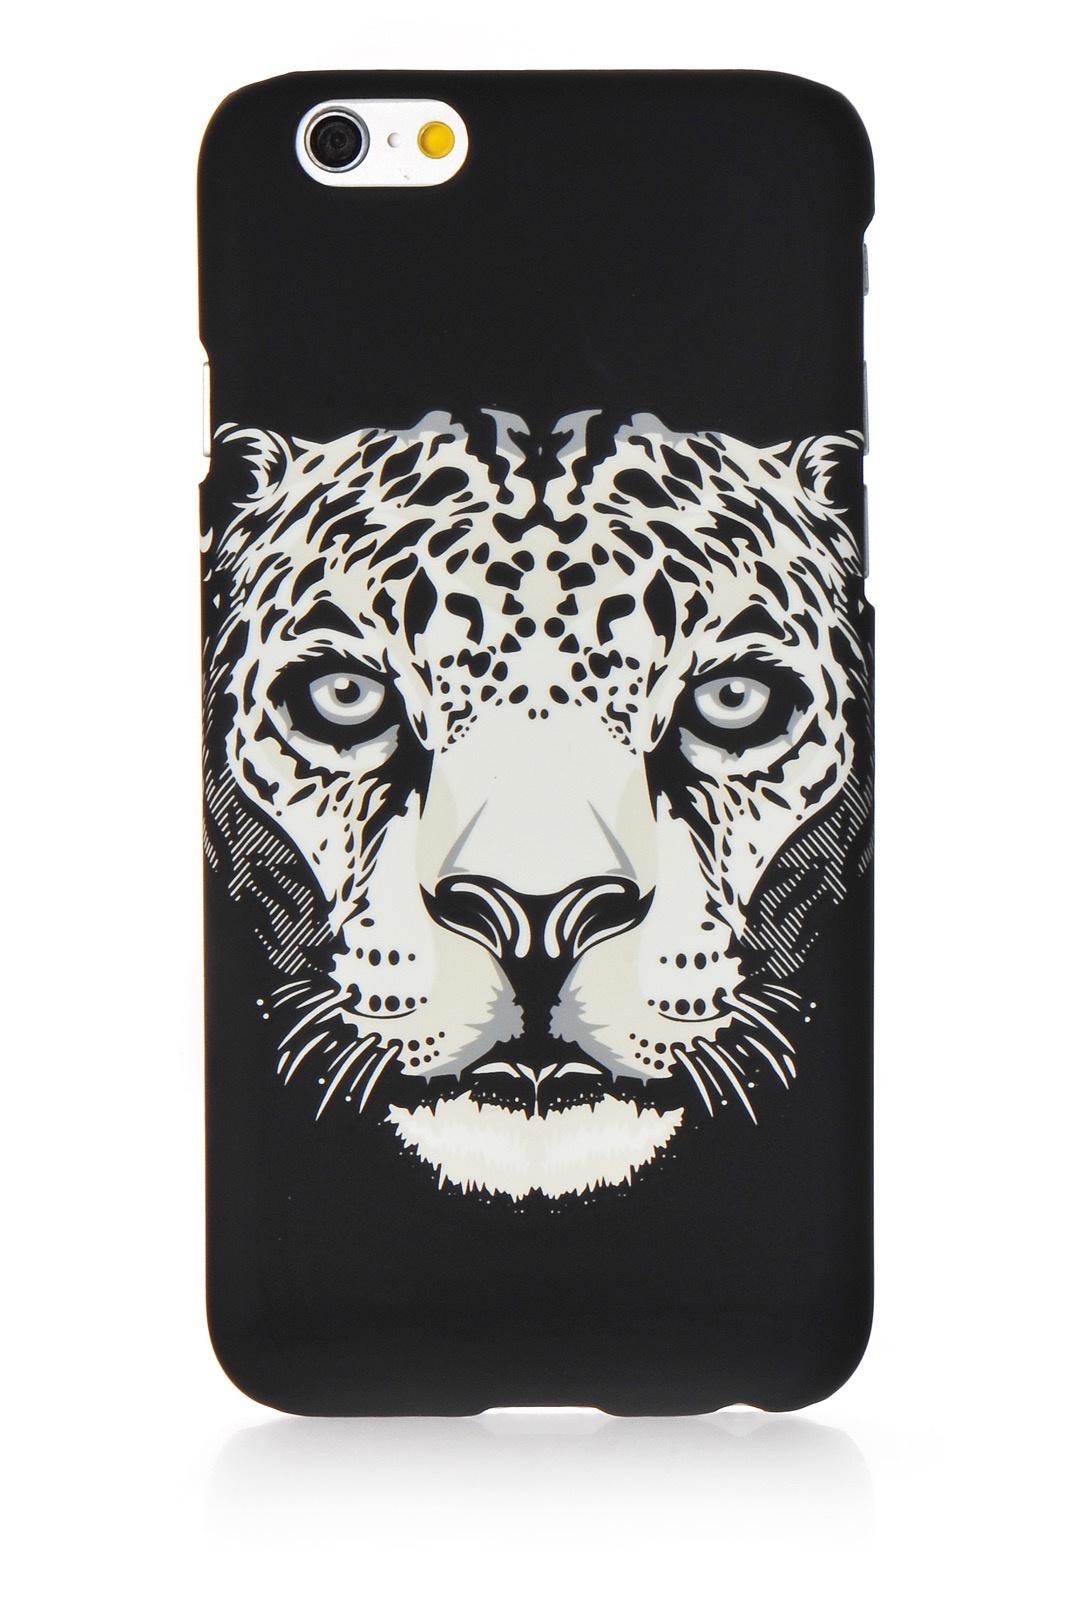 "Чехол для сотового телефона Gurdini Animal пластик soft touch стиль 3 для Apple iPhone 6 Plus/6S Plus 5.5"", черный"